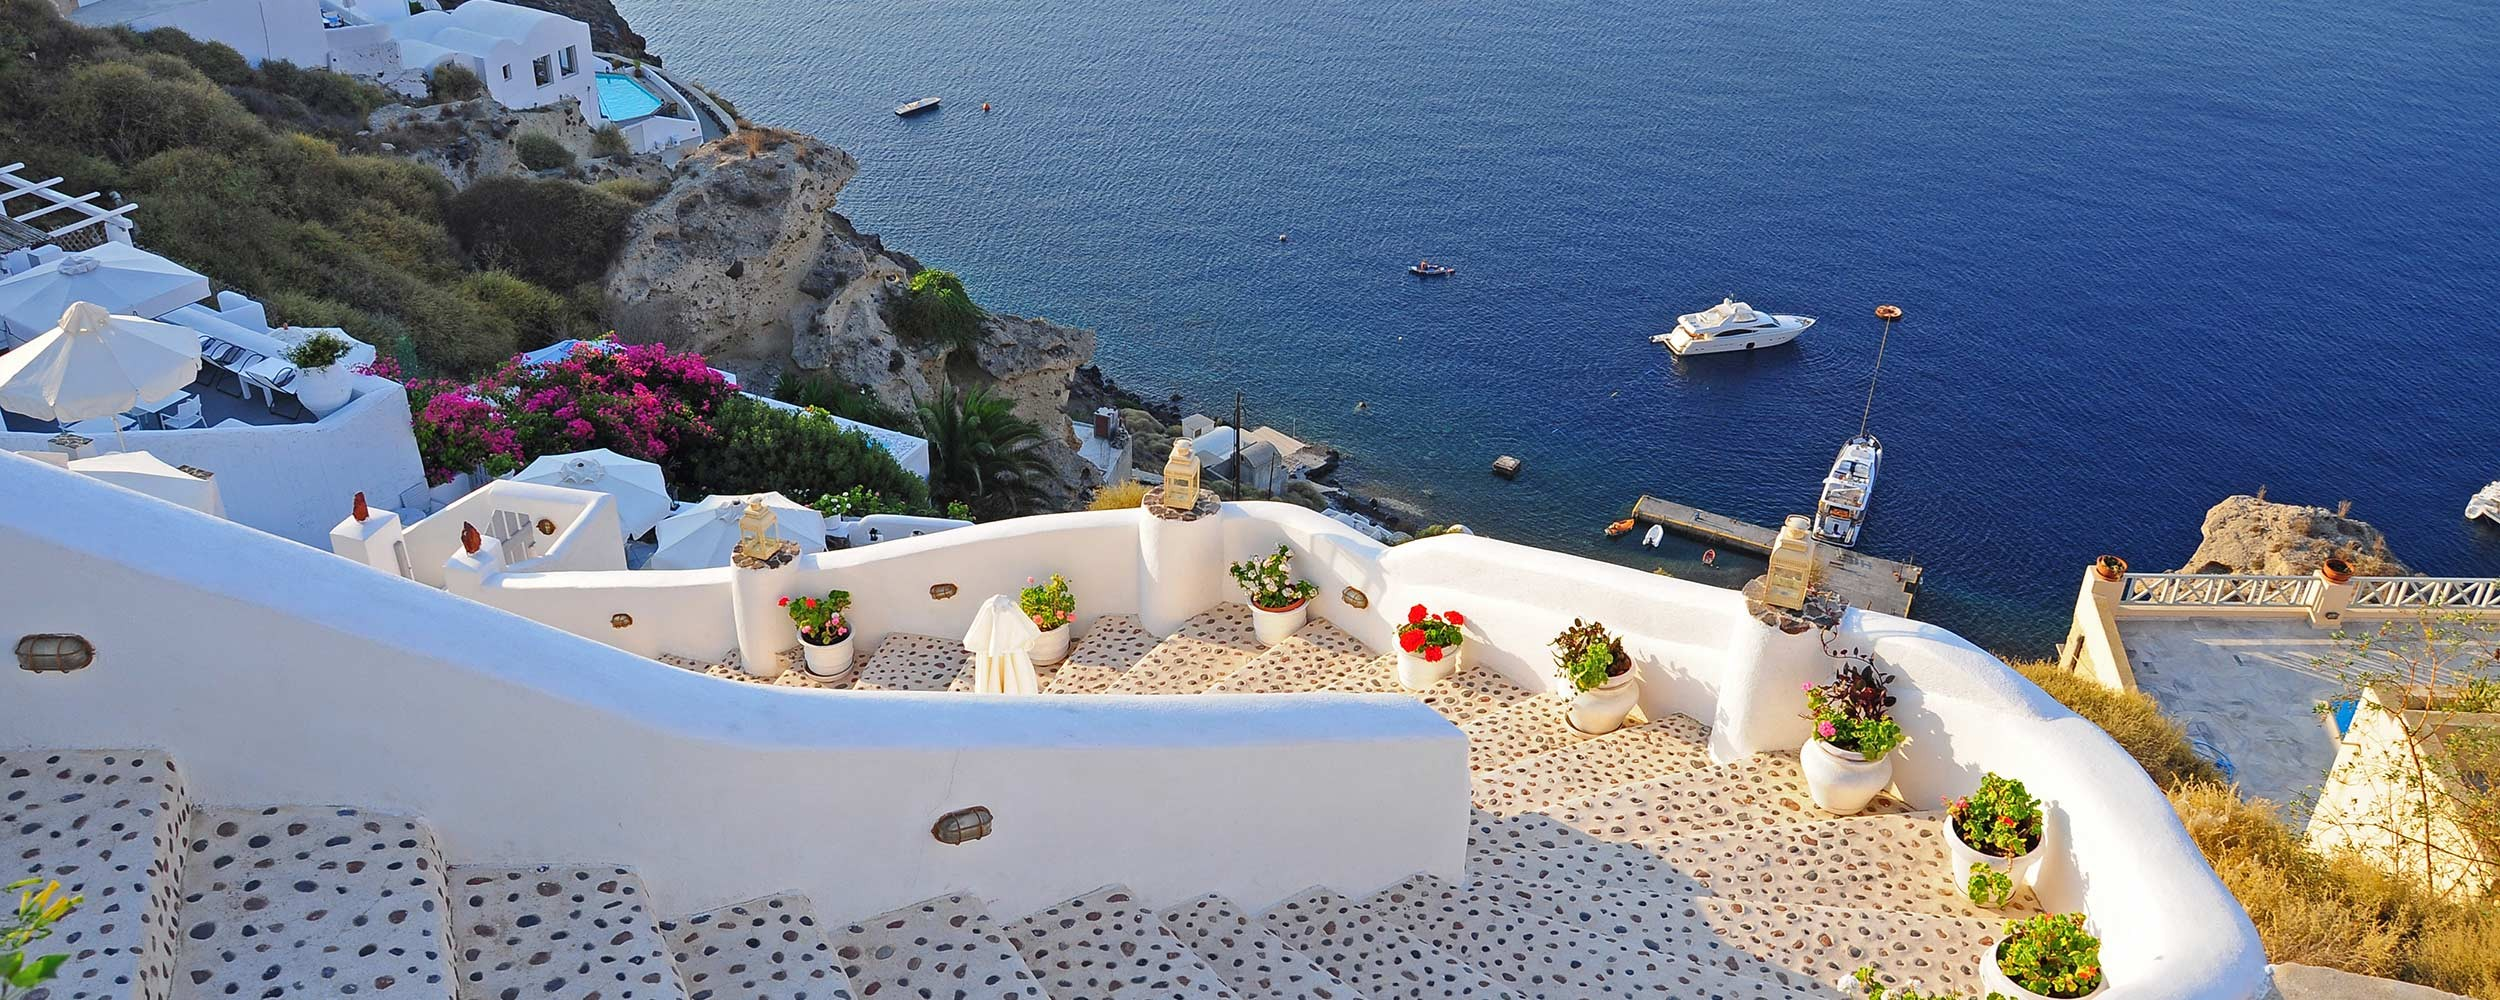 Voyages Iles Cyclades Santorin